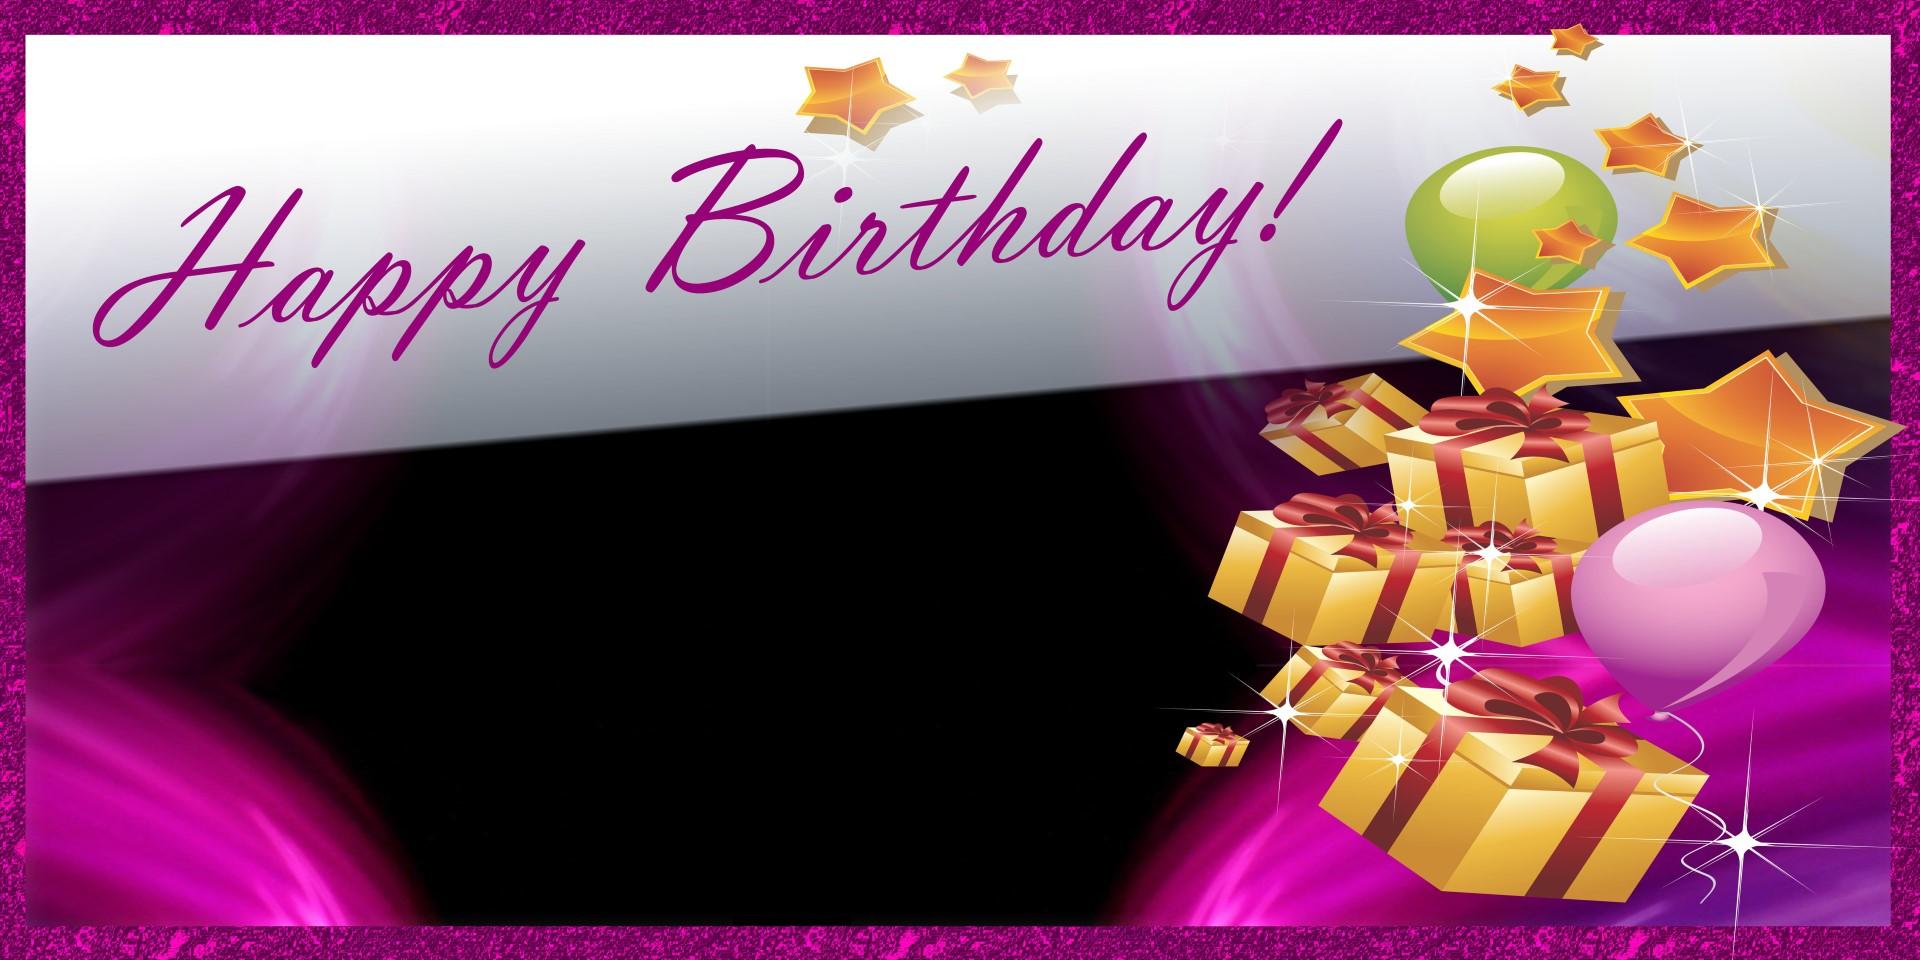 happy birthday banner gift stars pink vinyl banners gatorprints